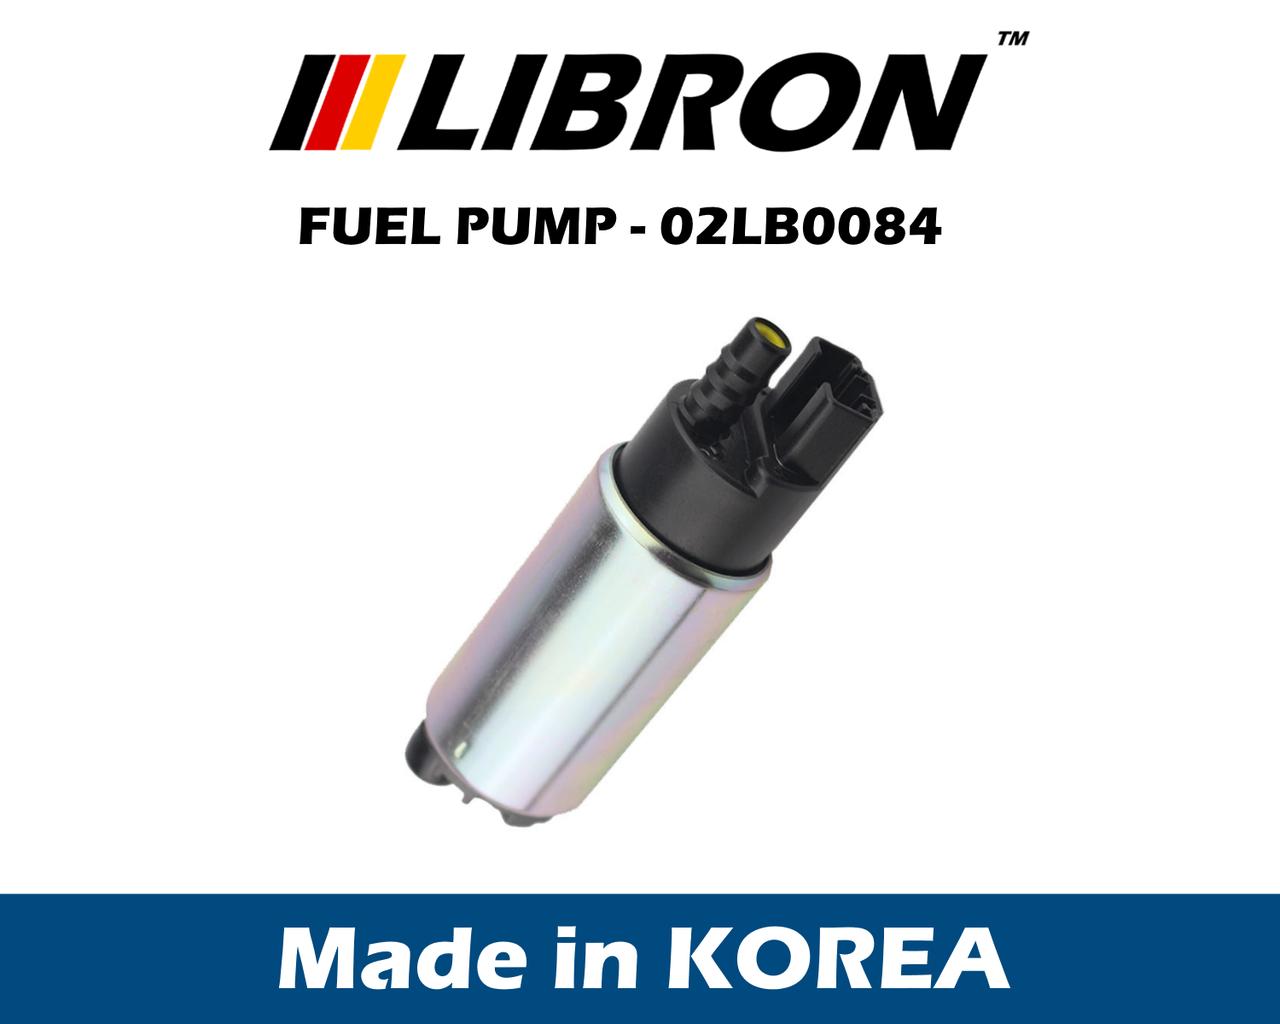 Топливный насос LIBRON 02LB0084 - JEEP  CHEROKEE